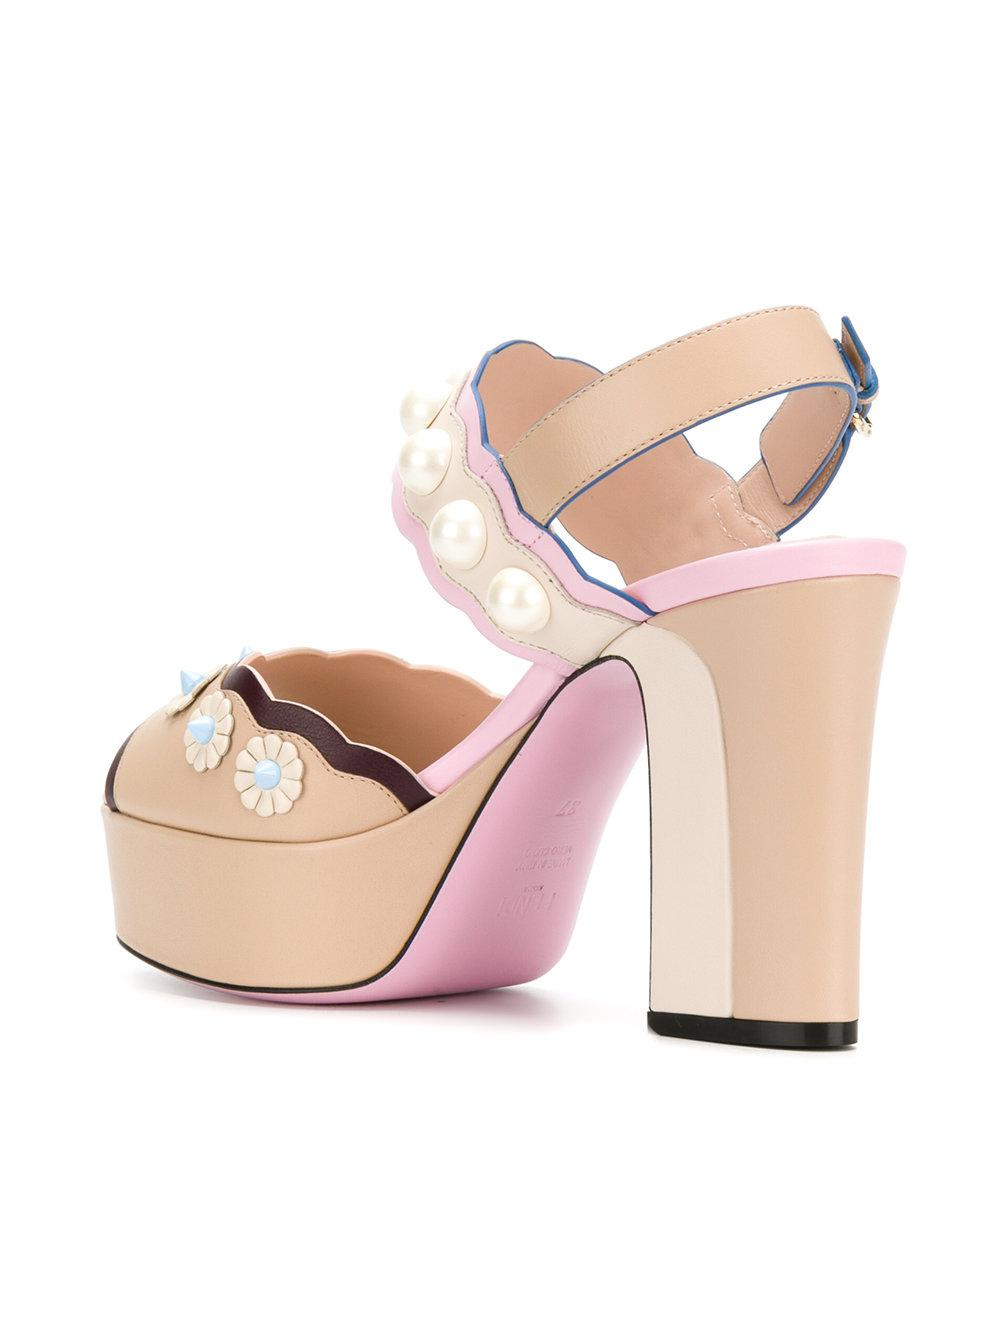 Fendi Scalloped open toe sandals EWoZX6r